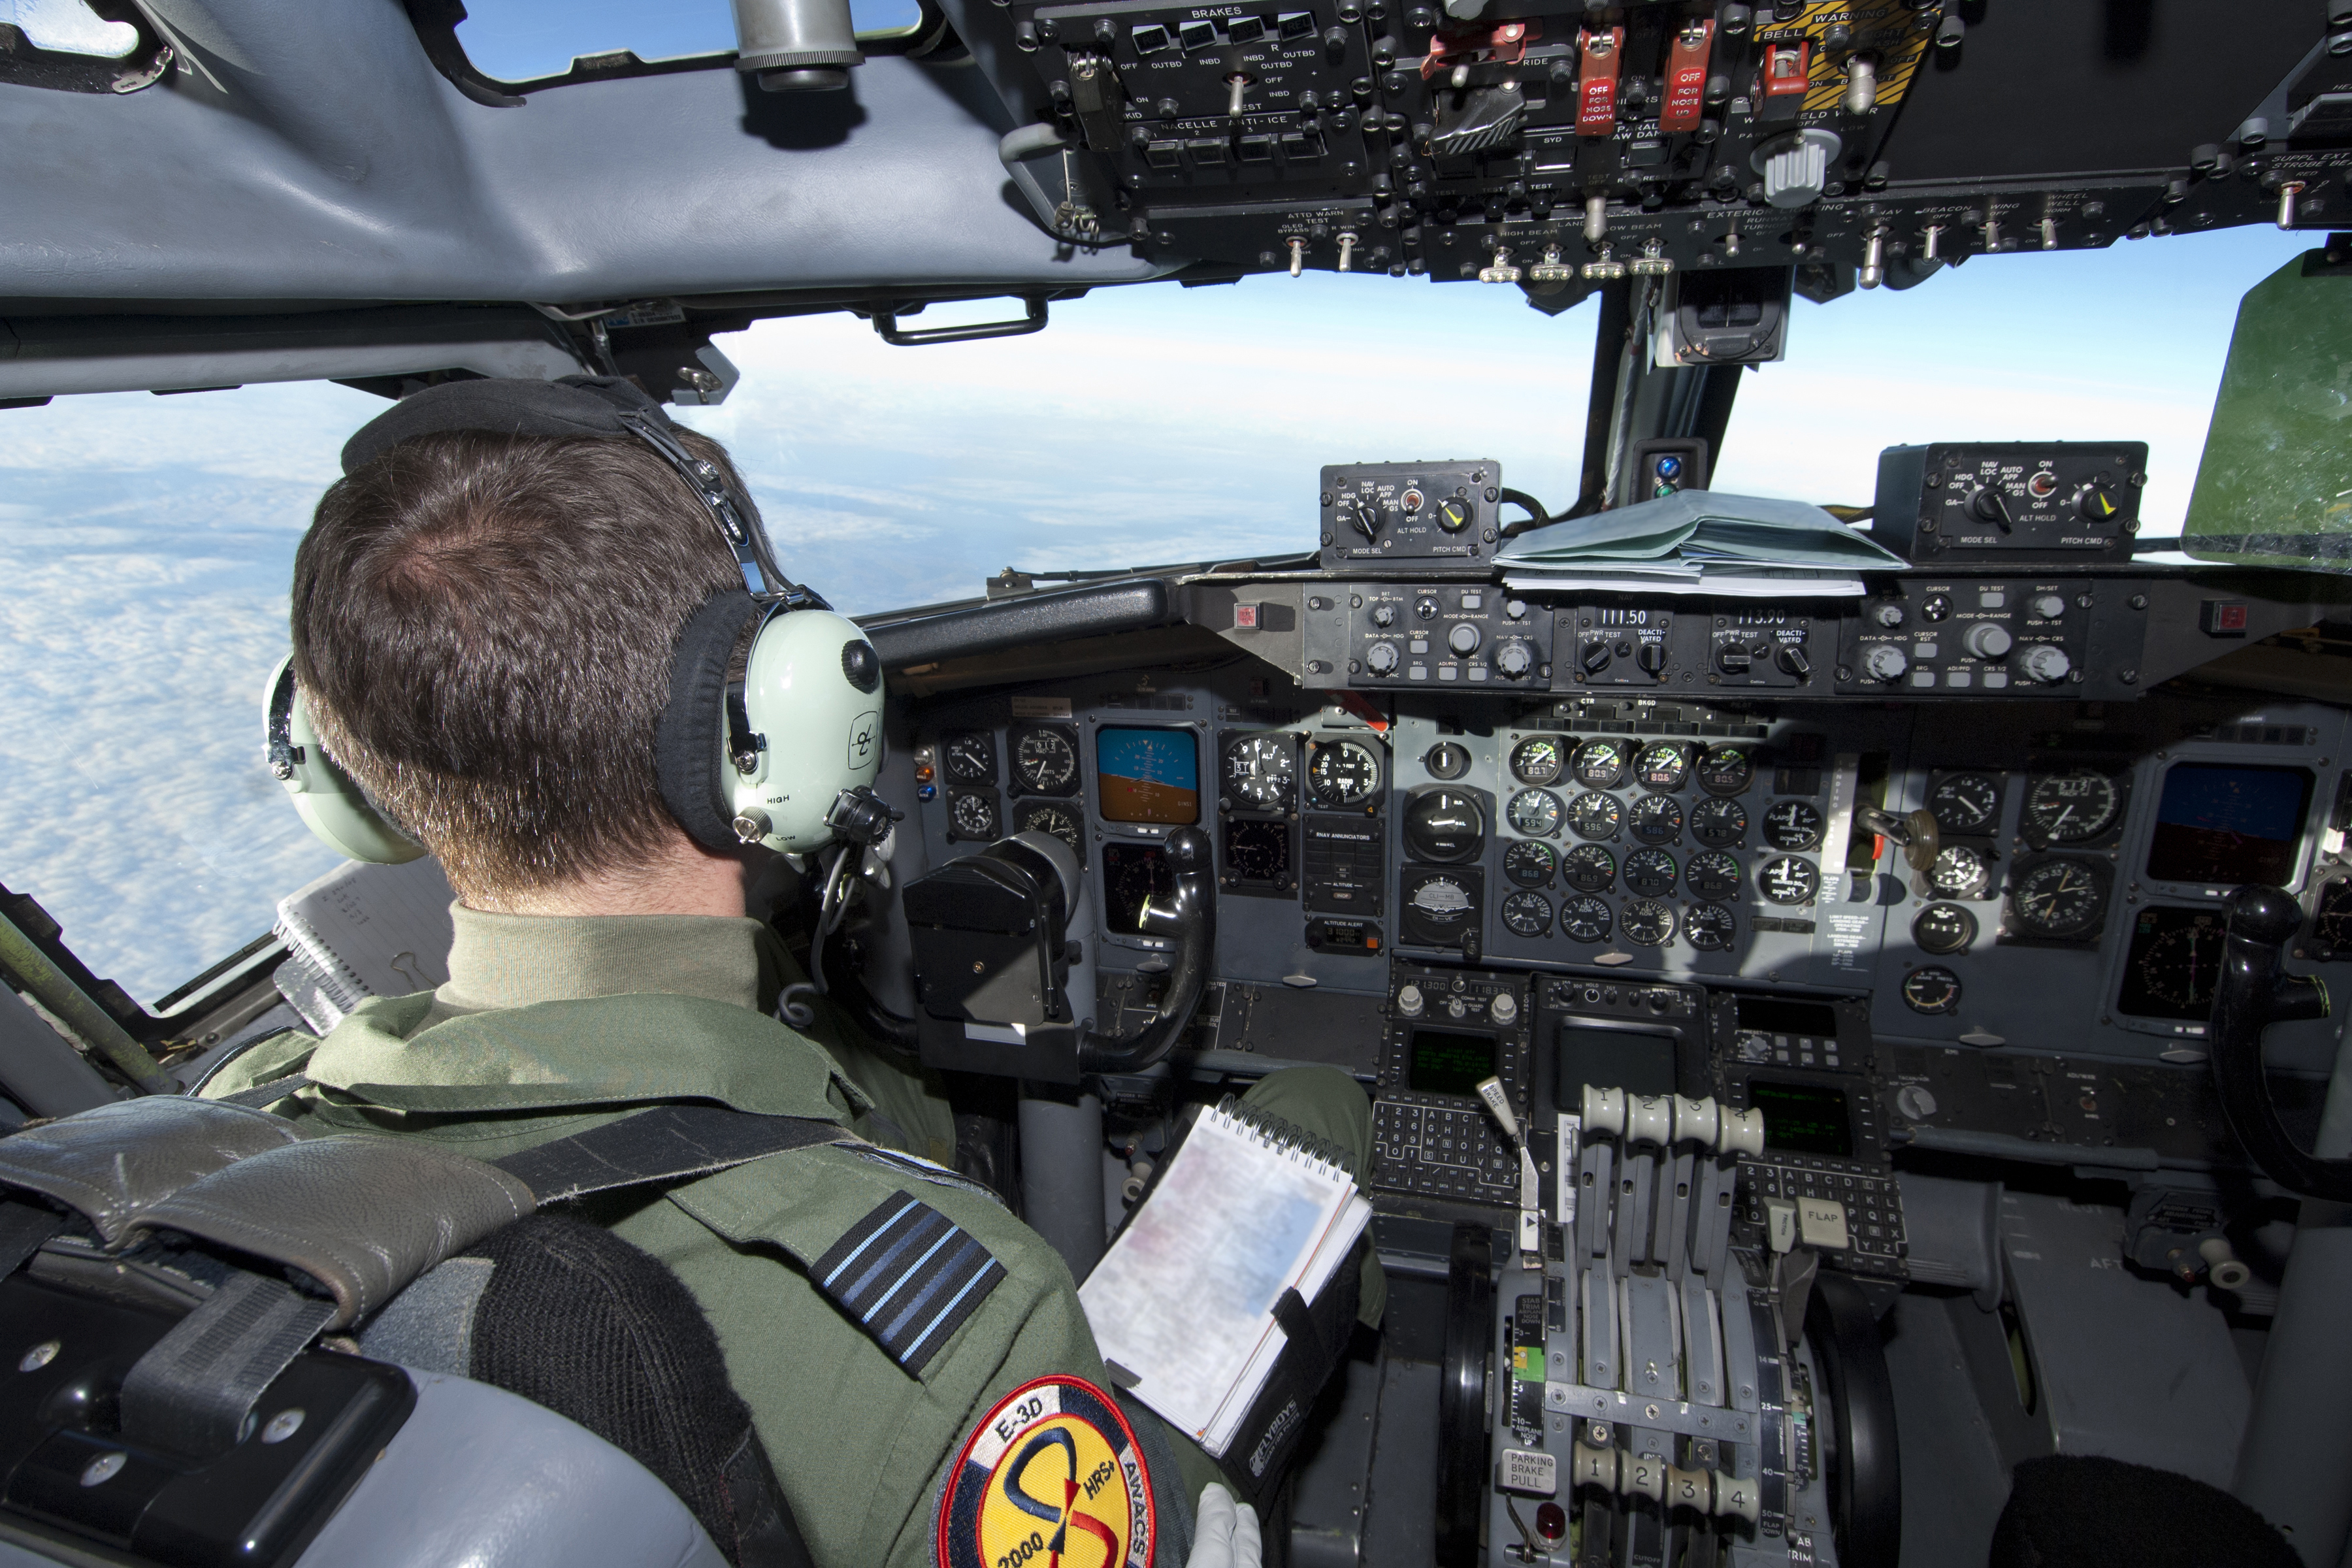 File:RAF E-3D Sentry AEW1 Pilot in the Cockpit MOD 45152316 jpg